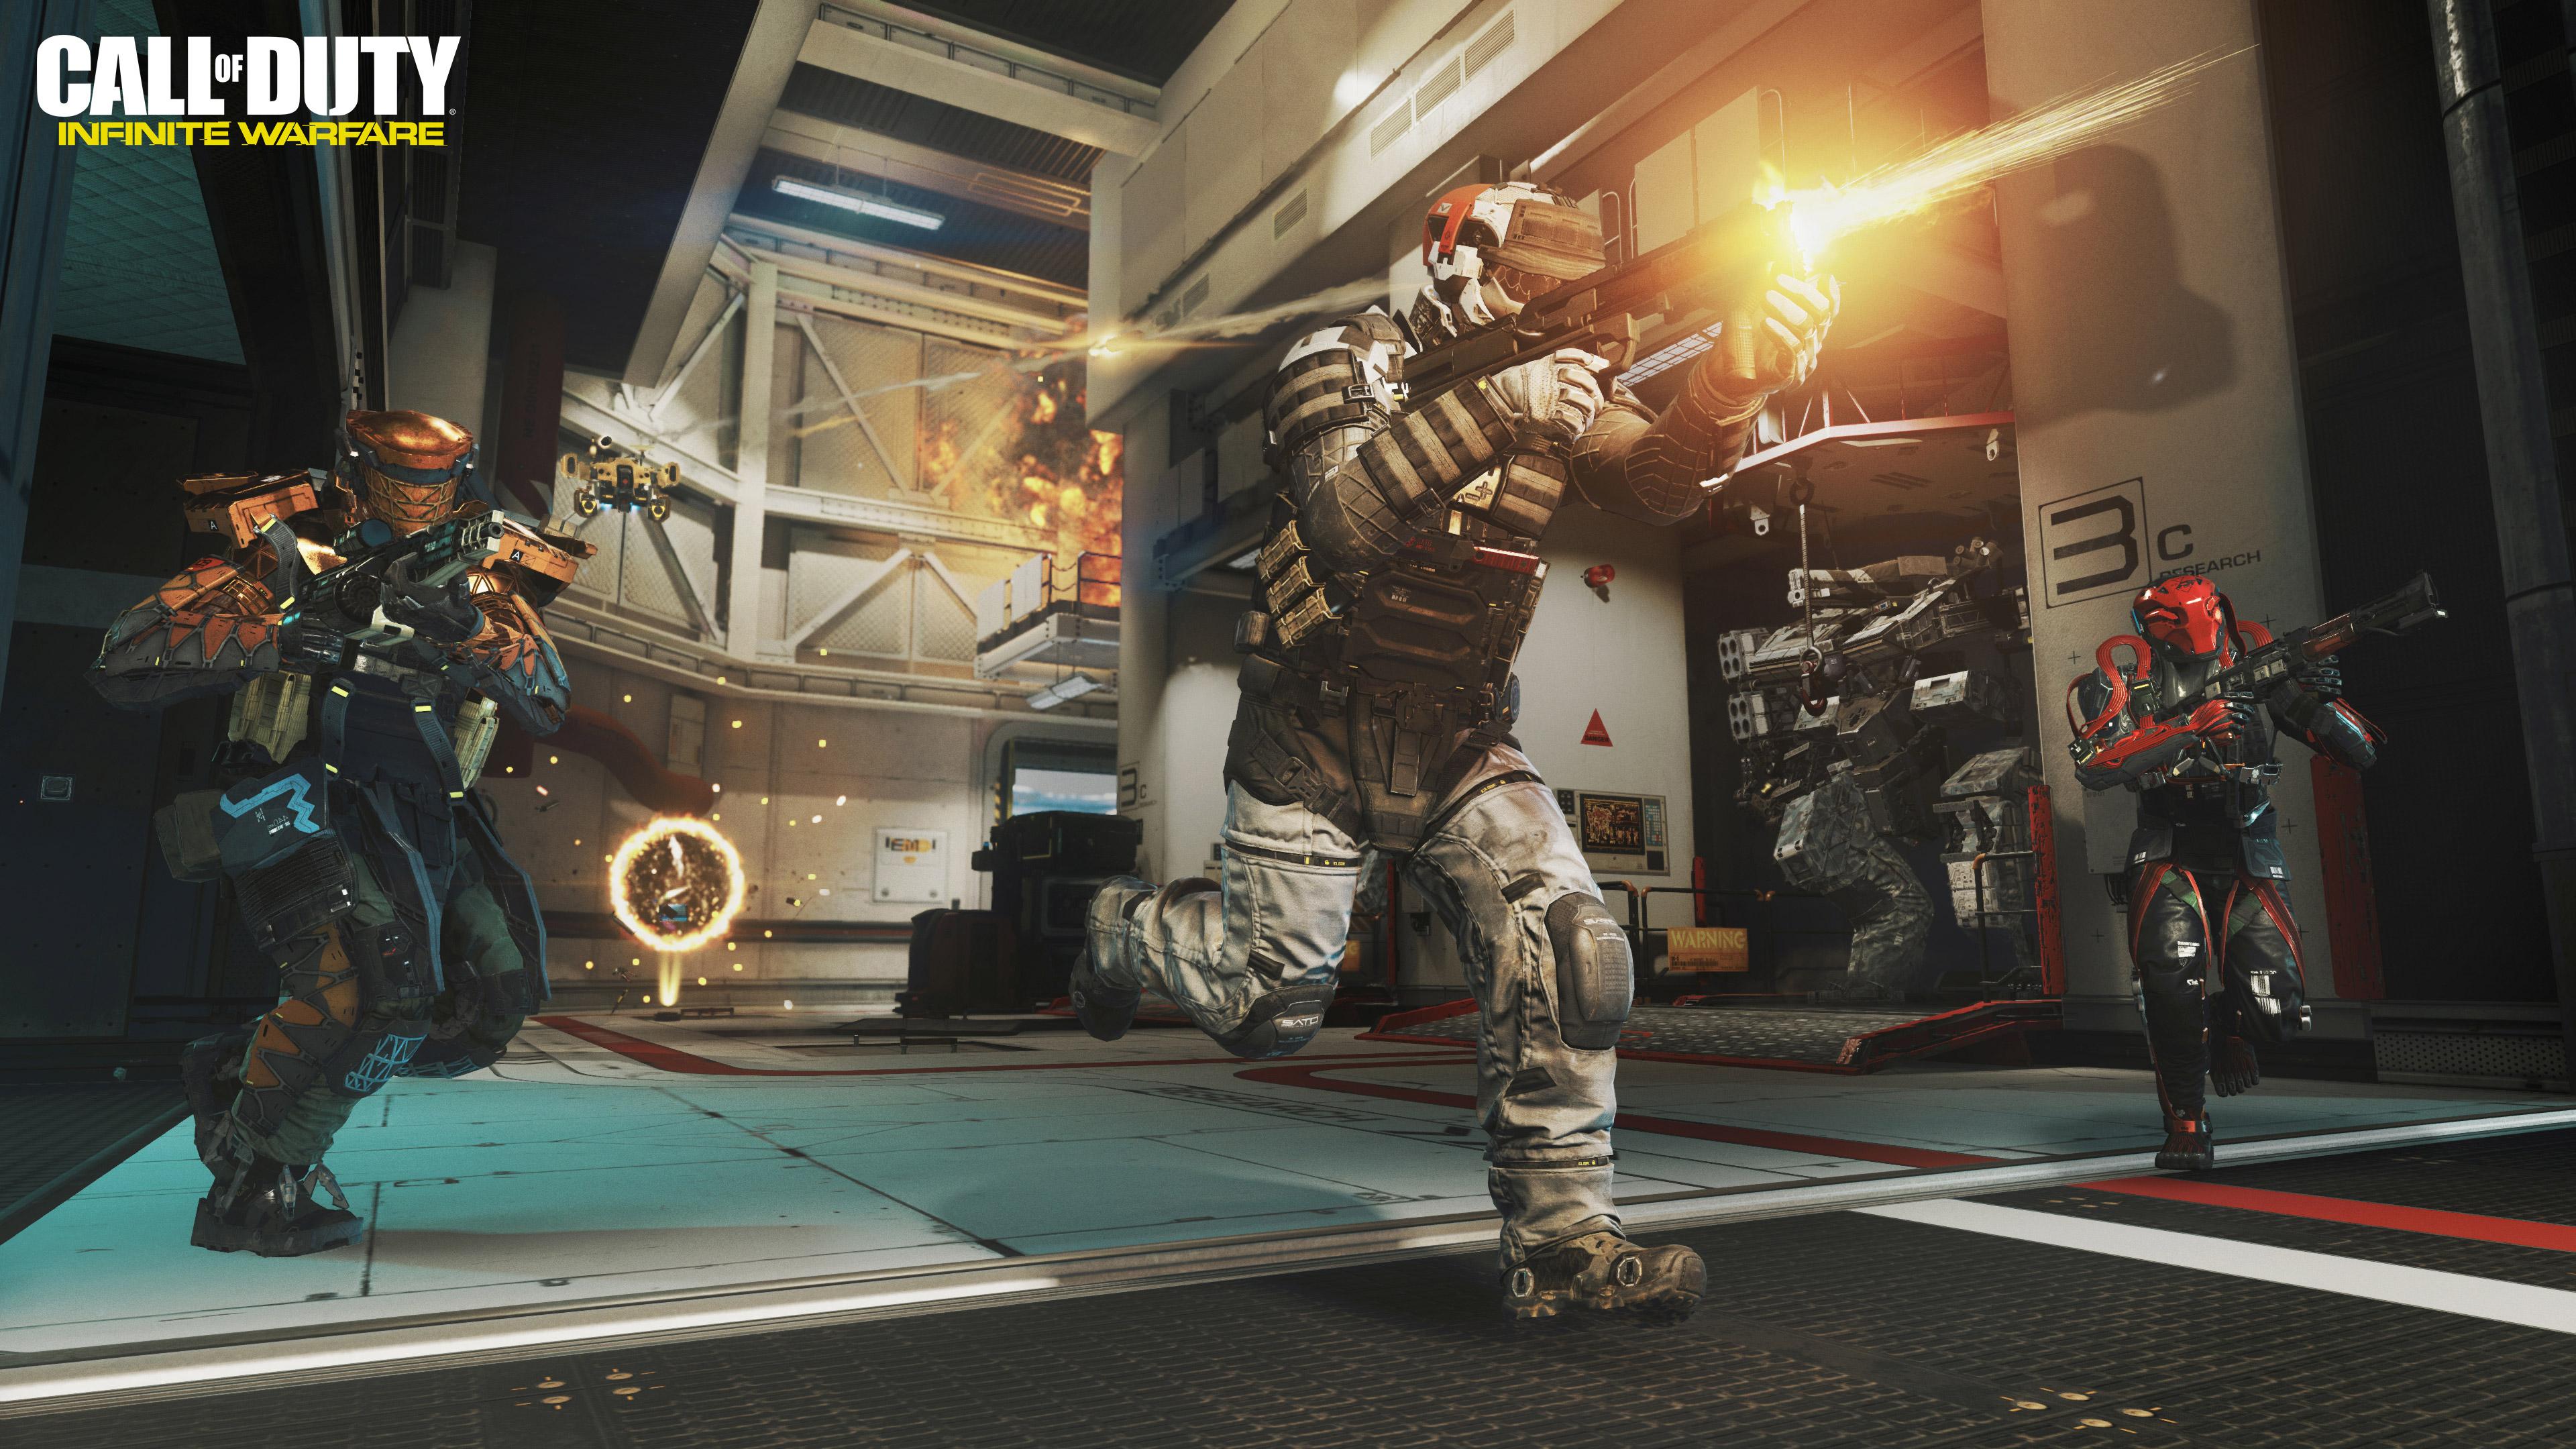 Cod Infinite Warfare Wallpaper: 2016 Call Of Duty Infinite Warfare, HD Games, 4k